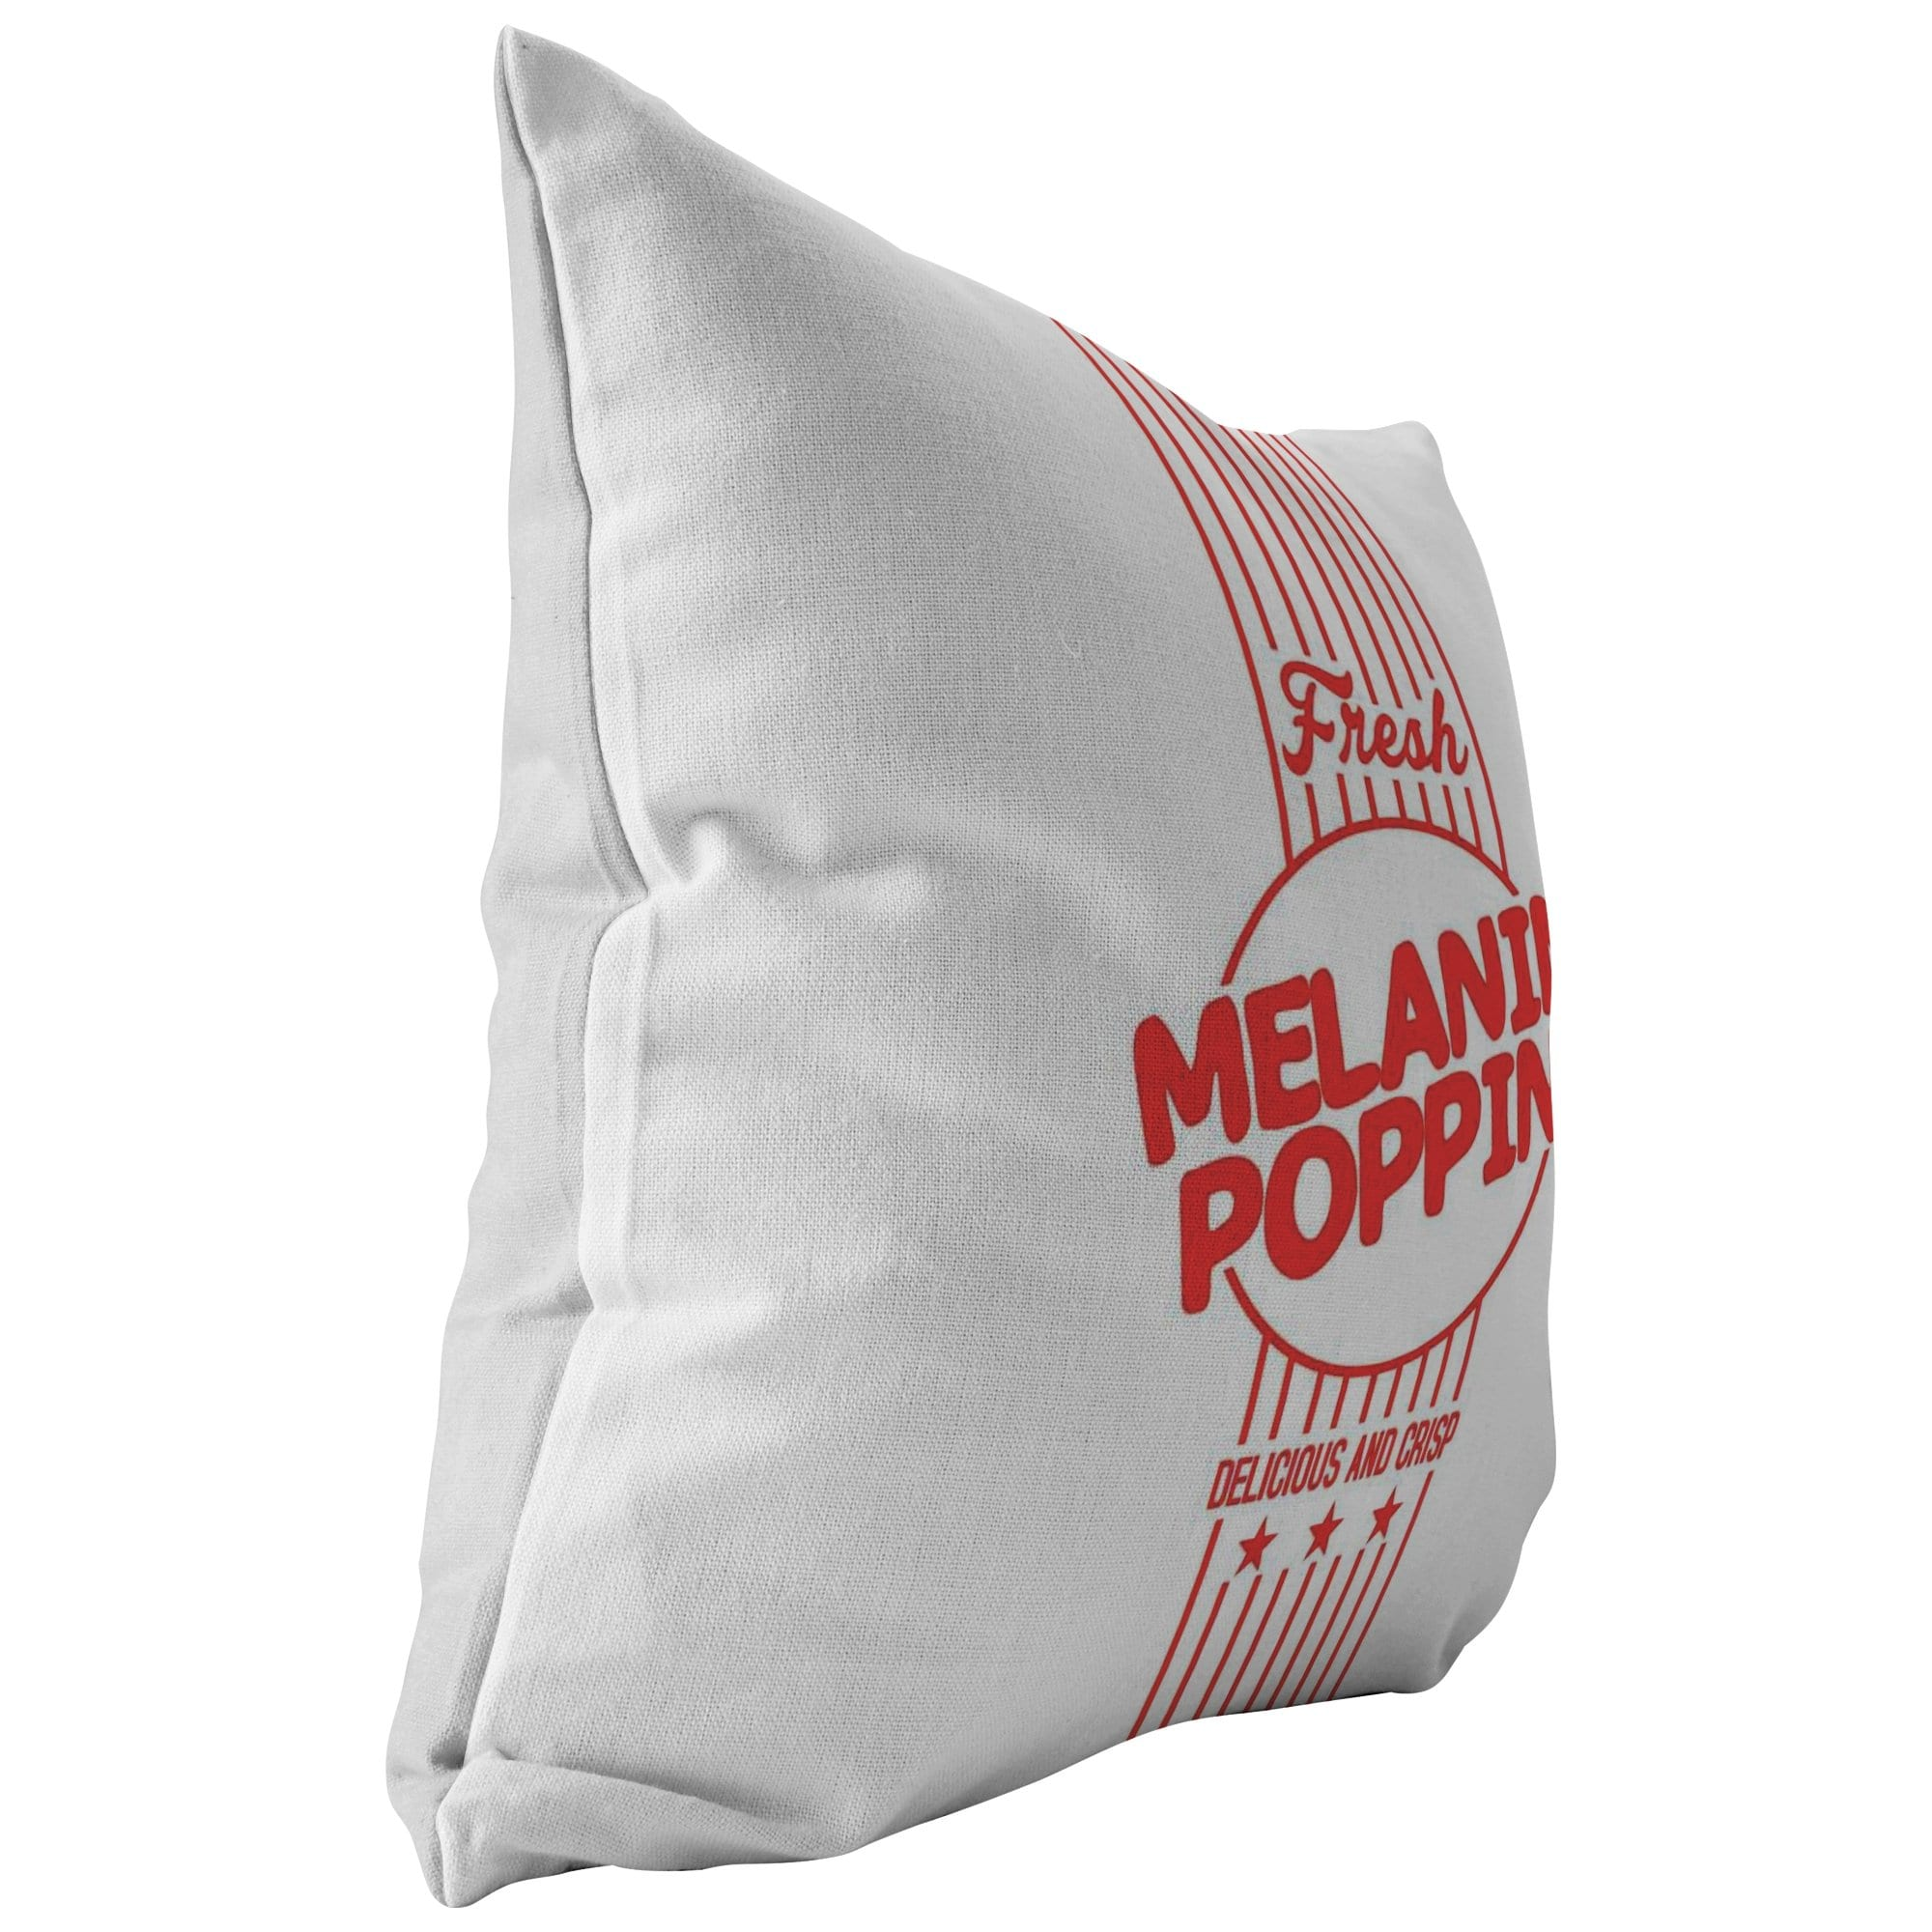 MELANIN POPPIN' Pillow - Melanin Apparel